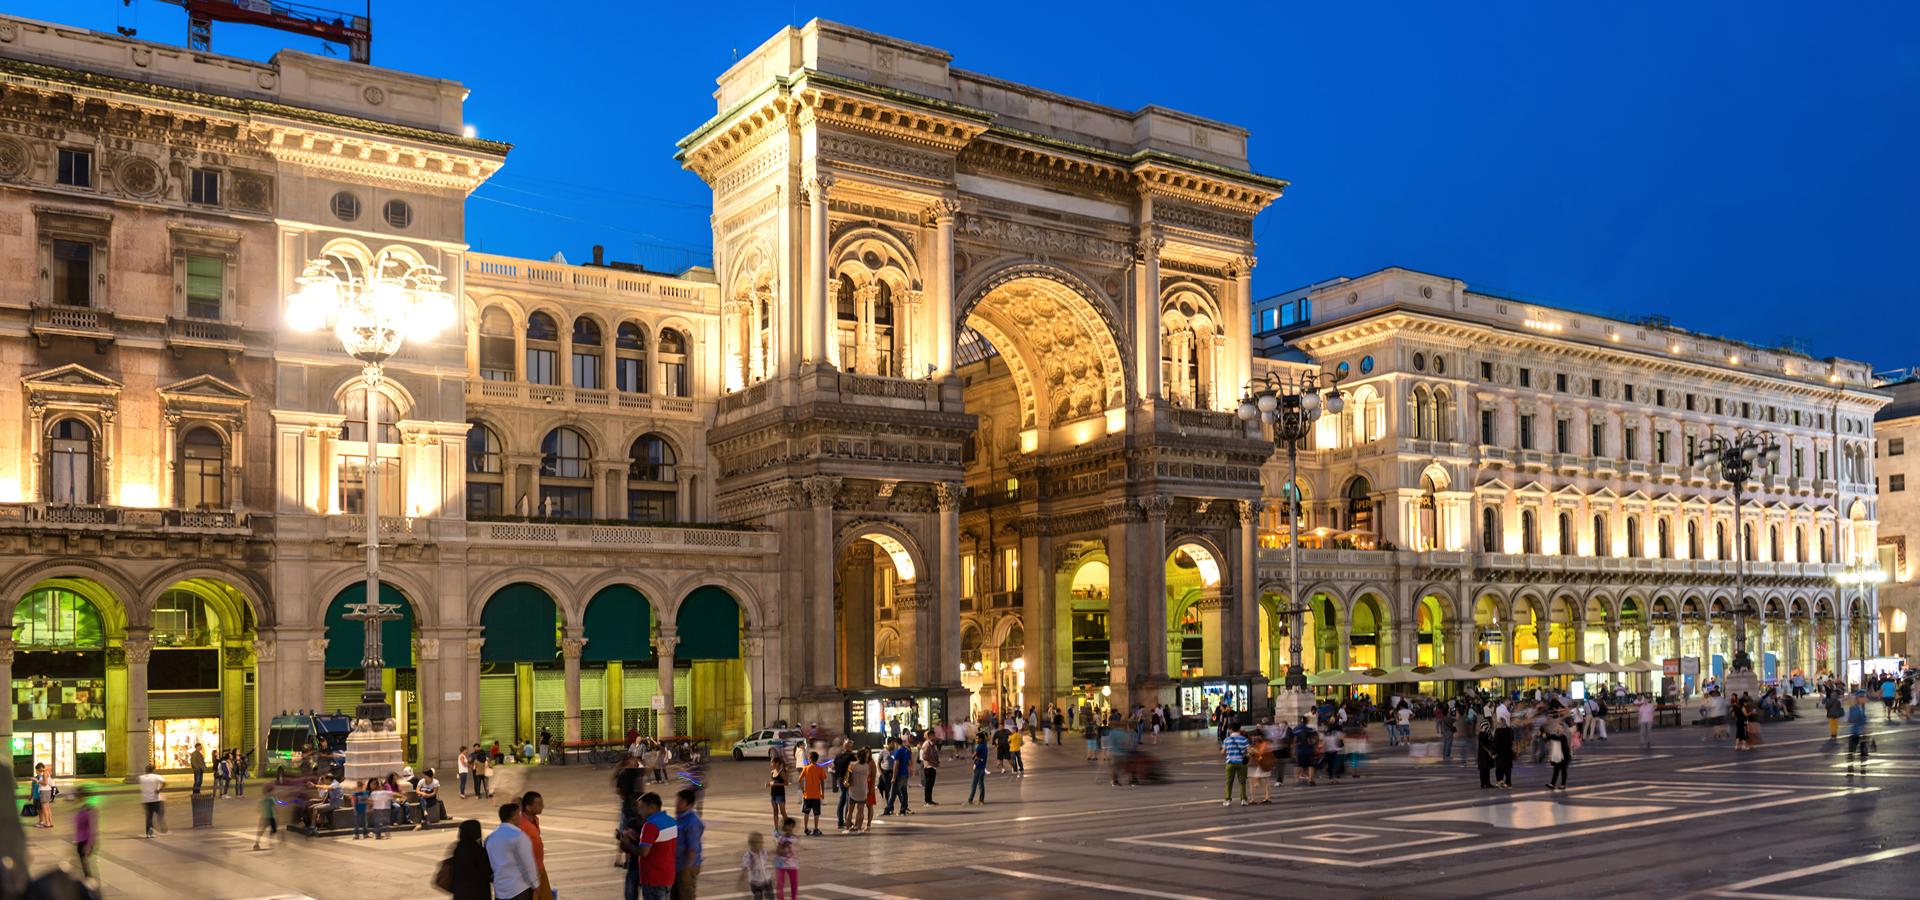 Peer-to-peer advisory in Milan, Lombardy, Italy